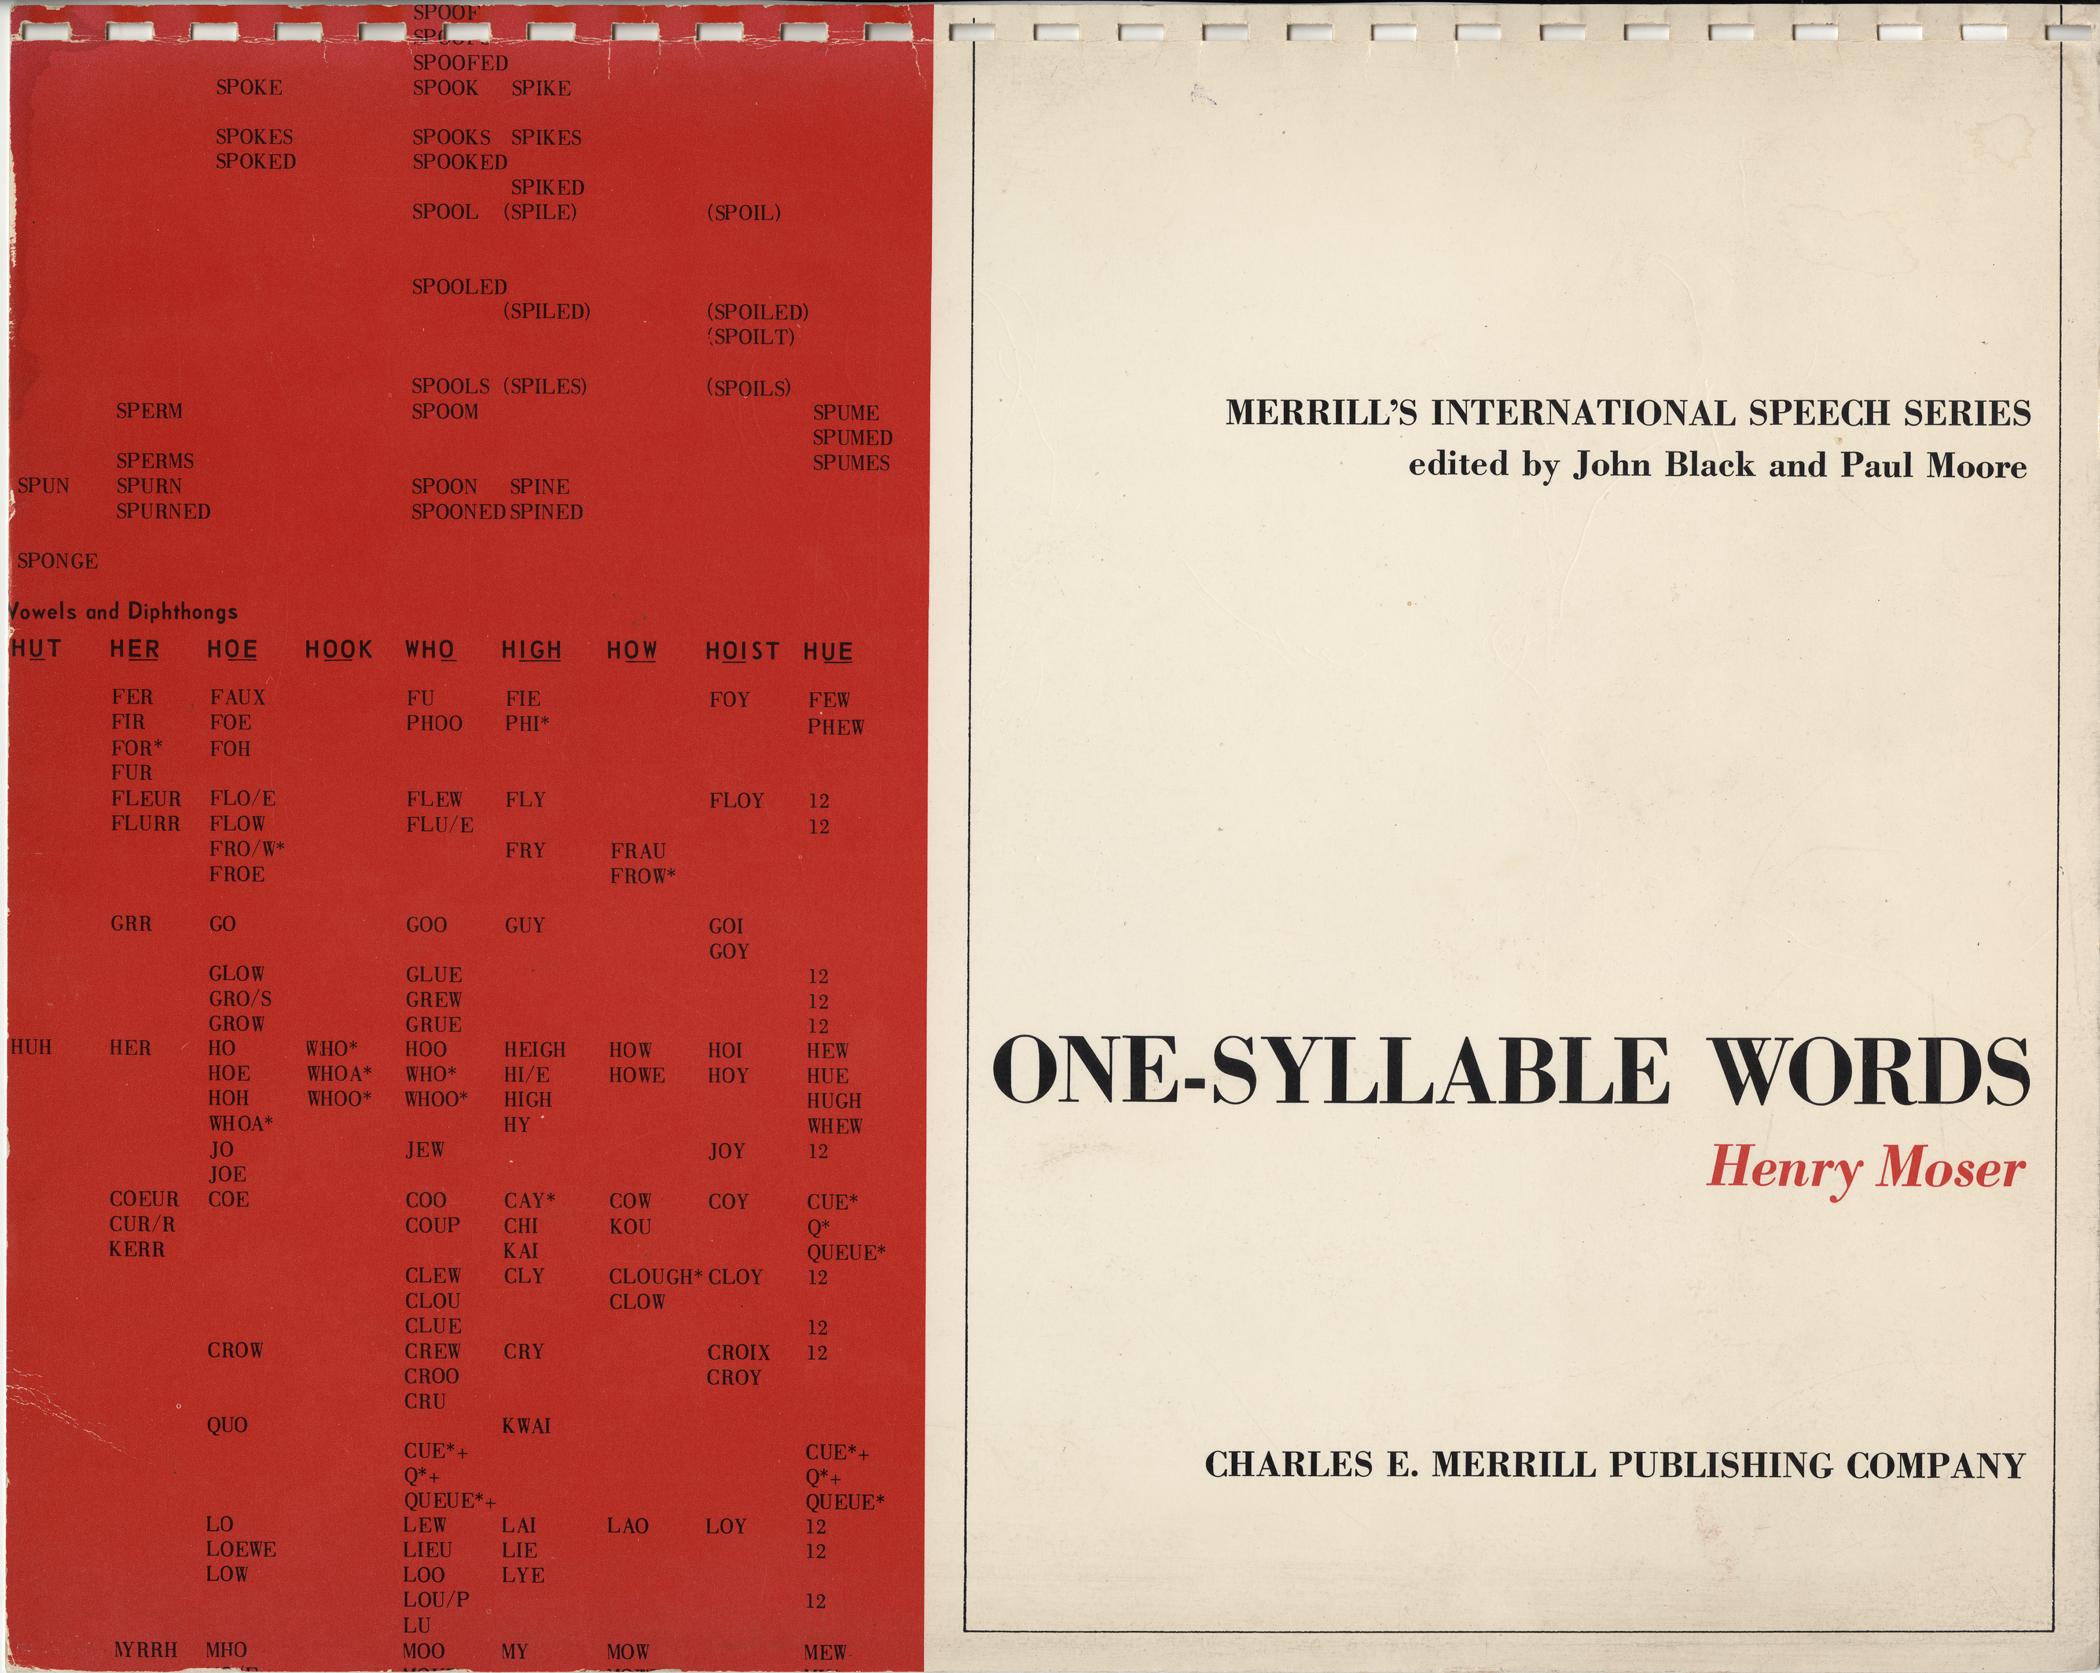 1-syllablecover.jpg